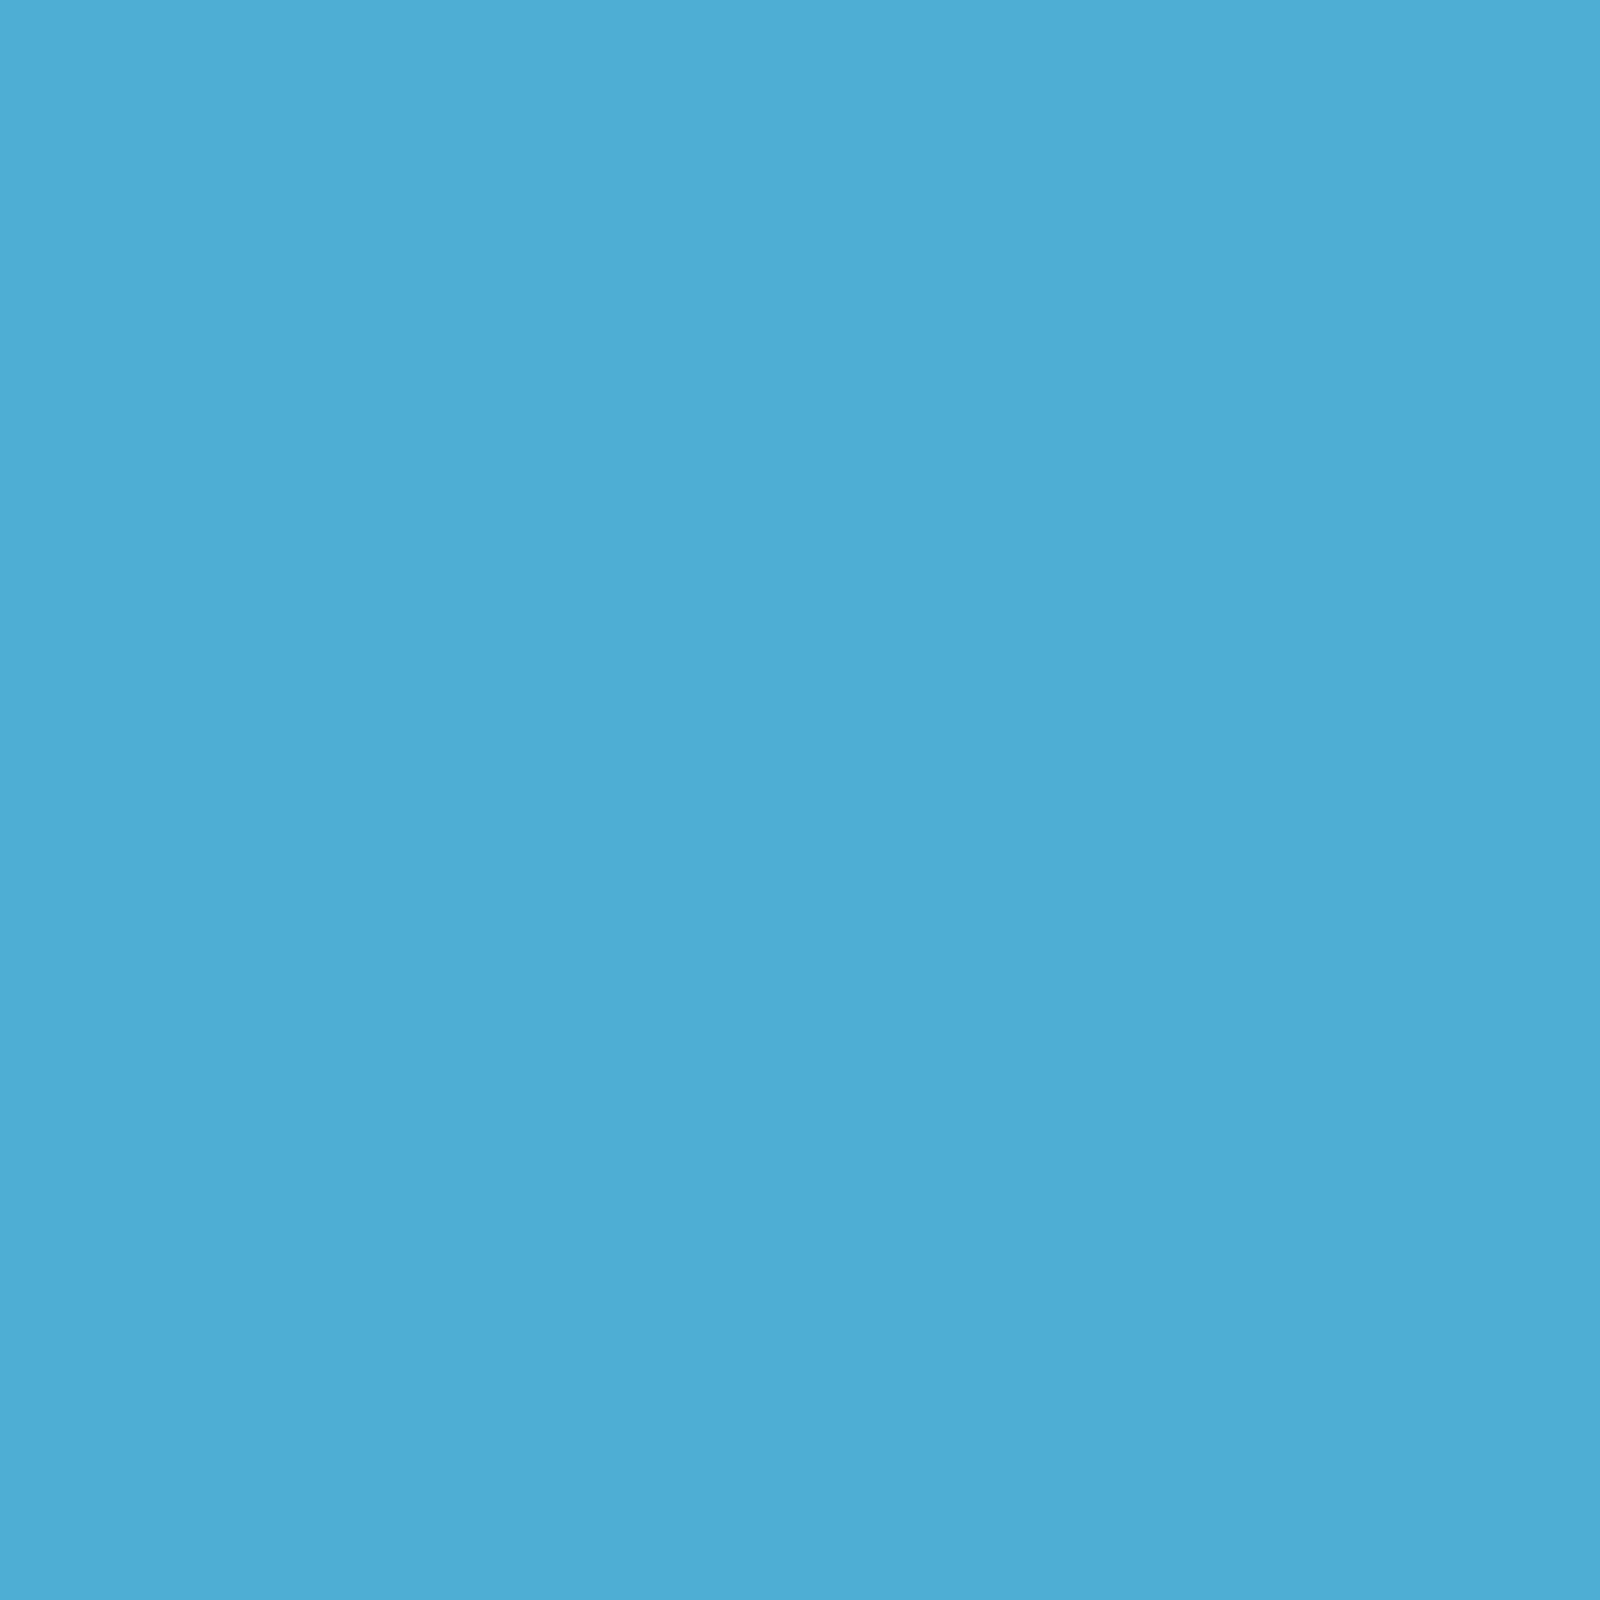 kobra albastru furtună